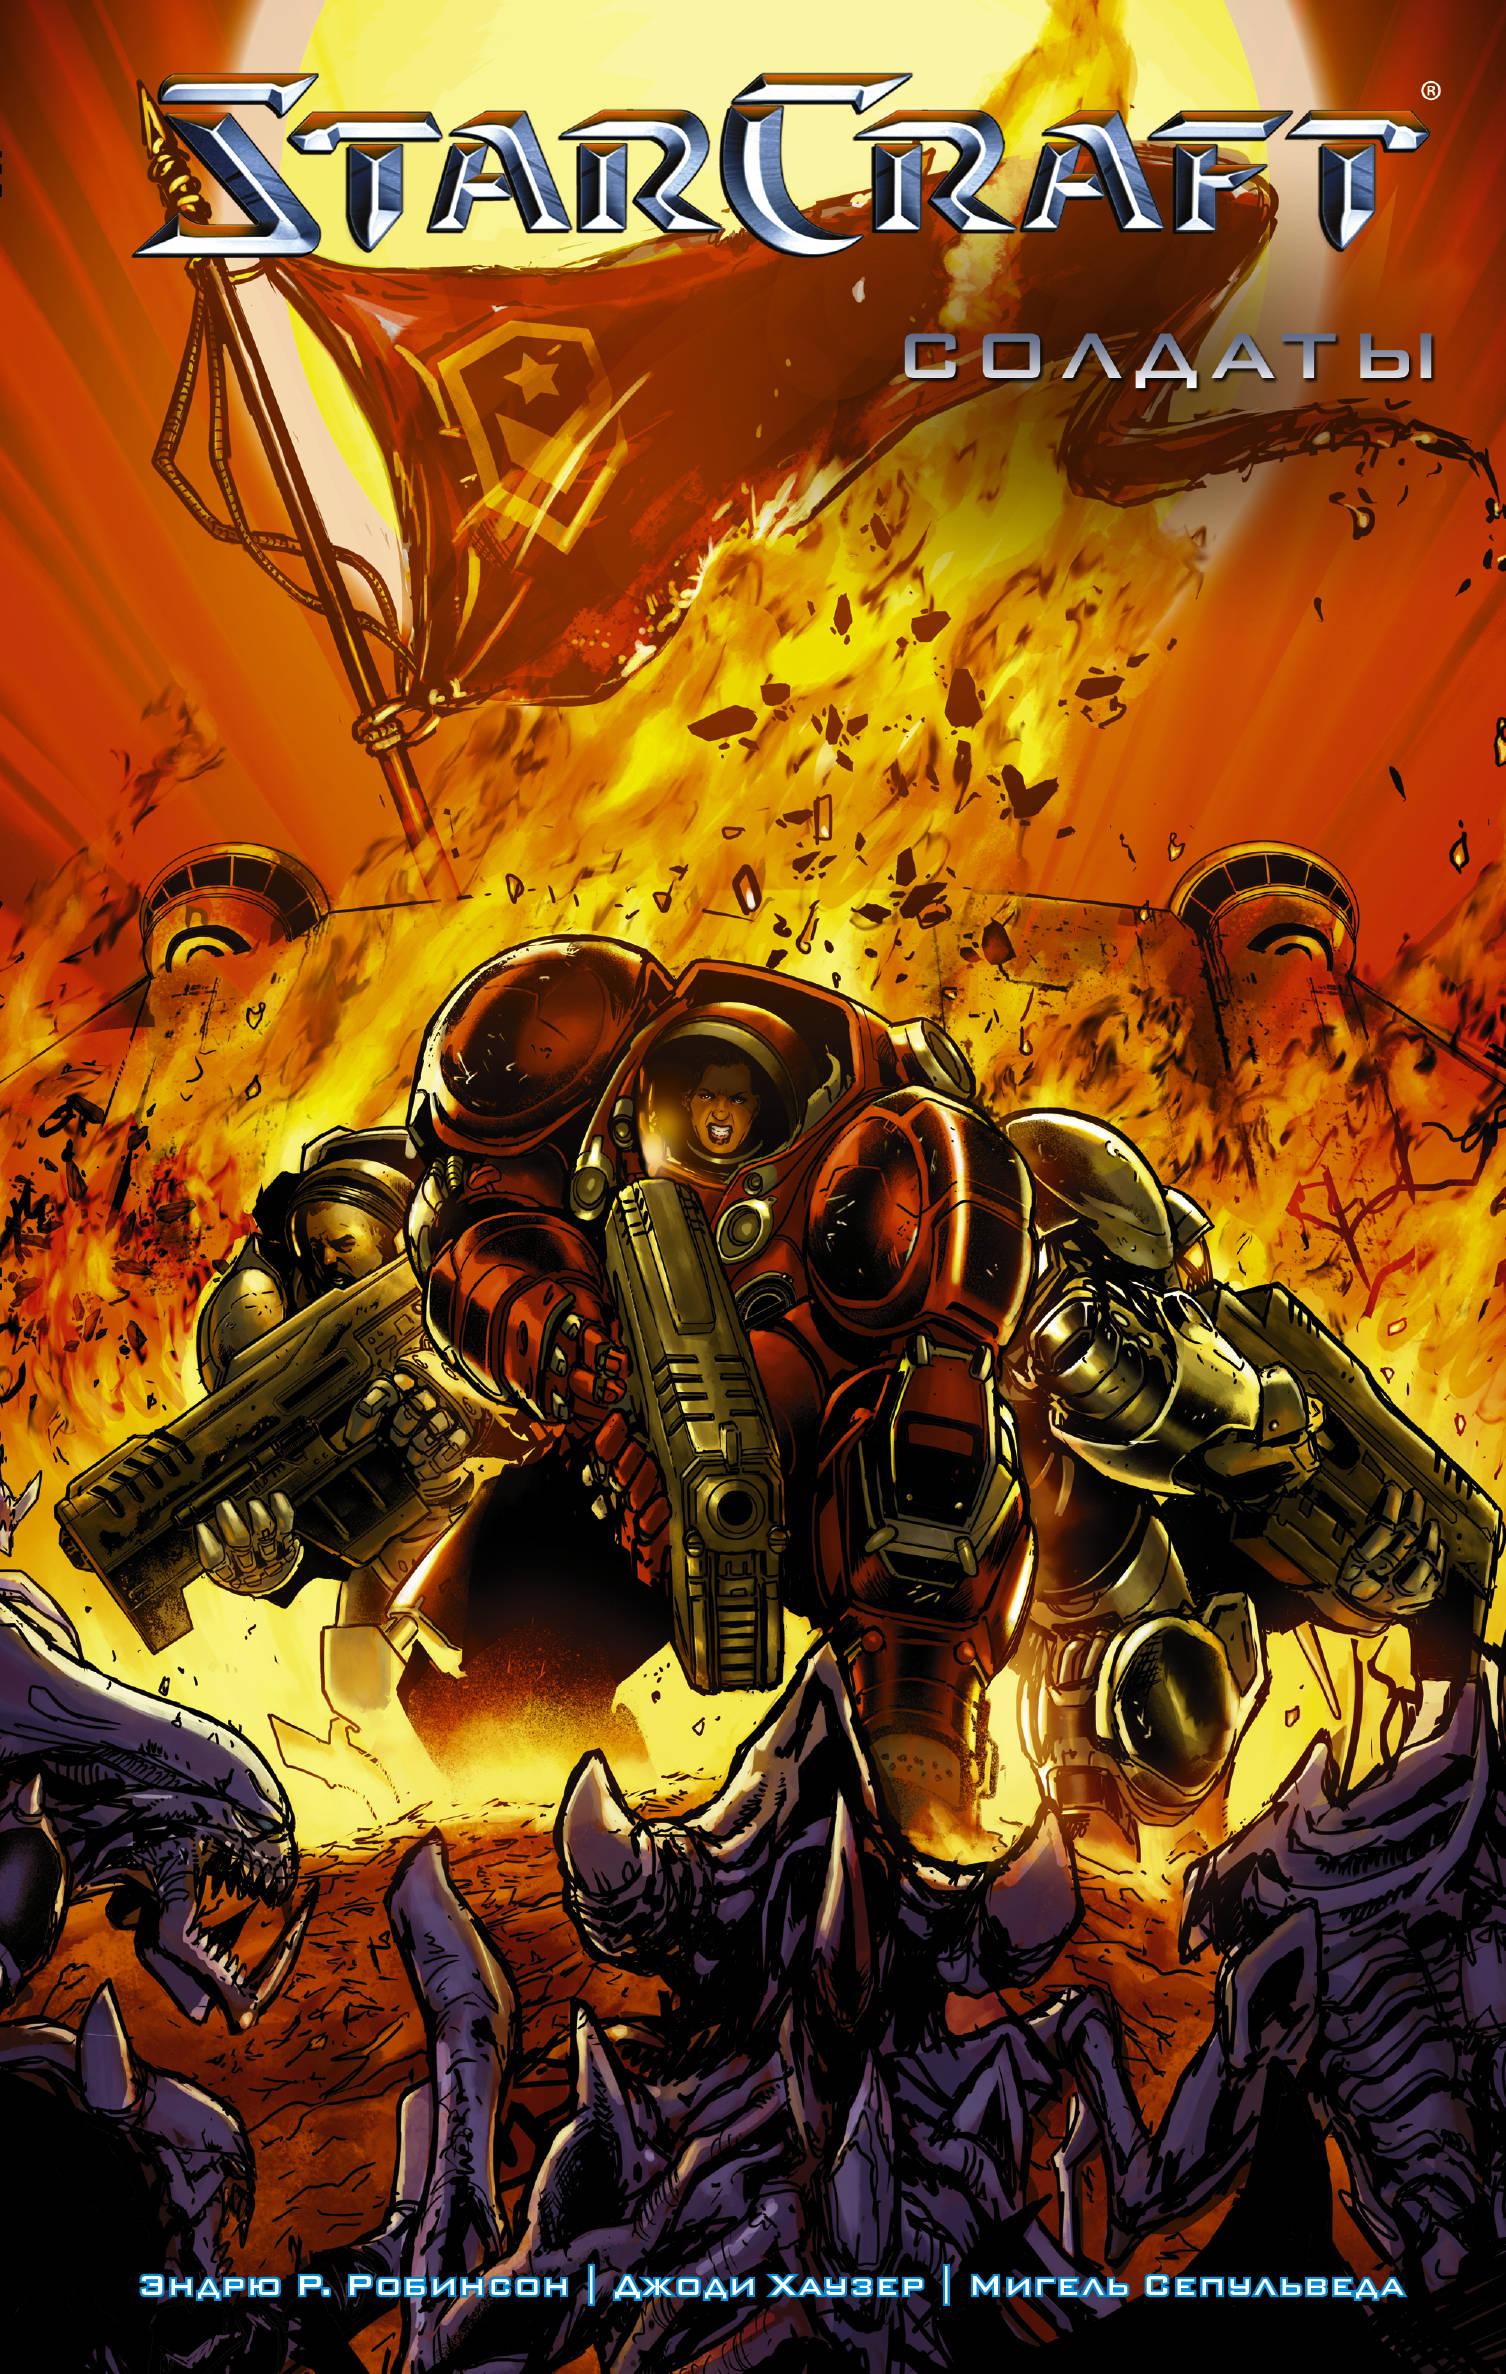 Хаузер Джоди, Робинсон Эндрю, Сепулведа Мигель StarCraft: Солдаты